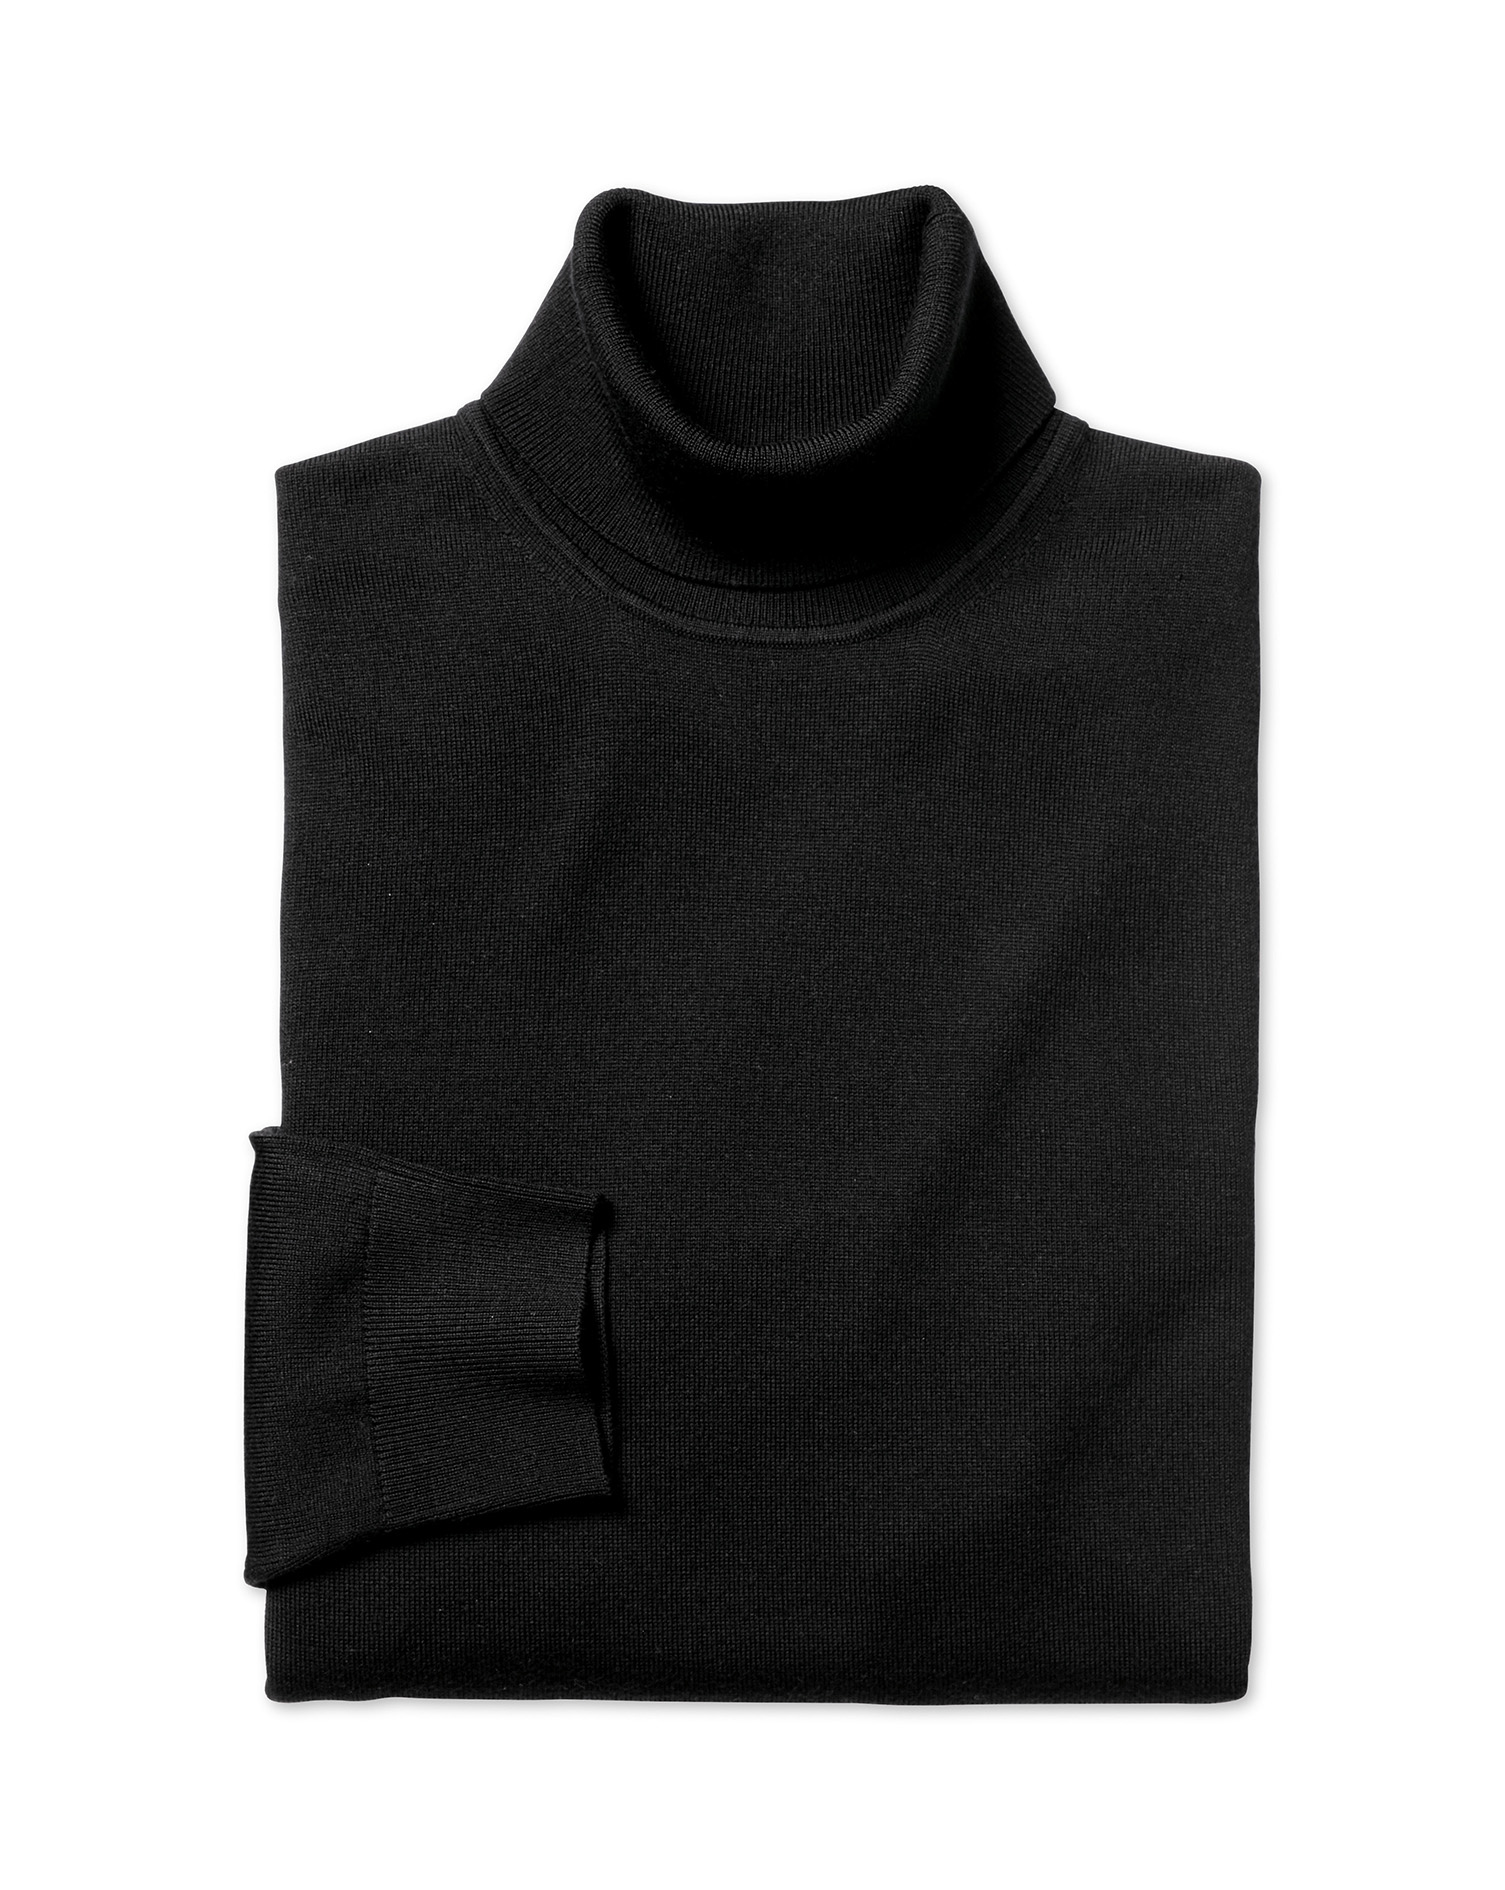 Black Merino Wool Roll Neck Jumper Size XS by Charles Tyrwhitt